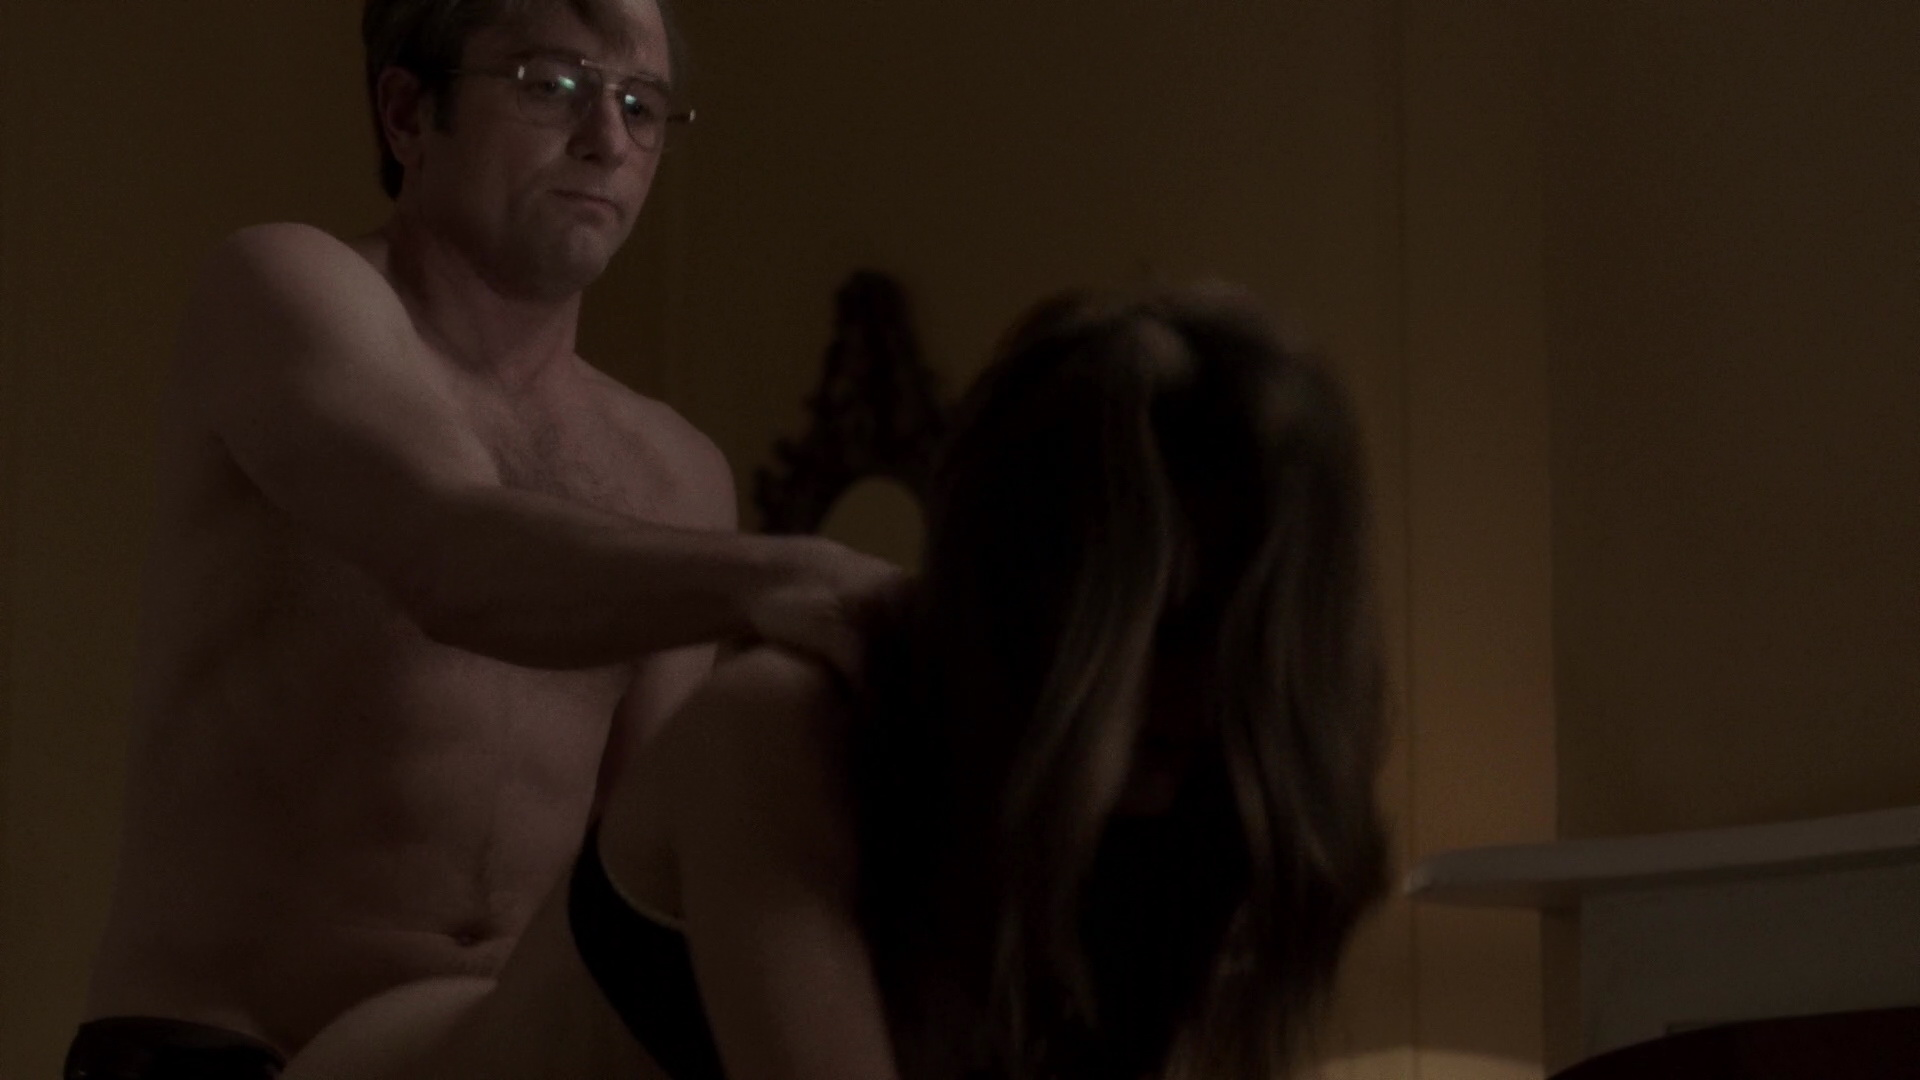 Keri russell americans nude